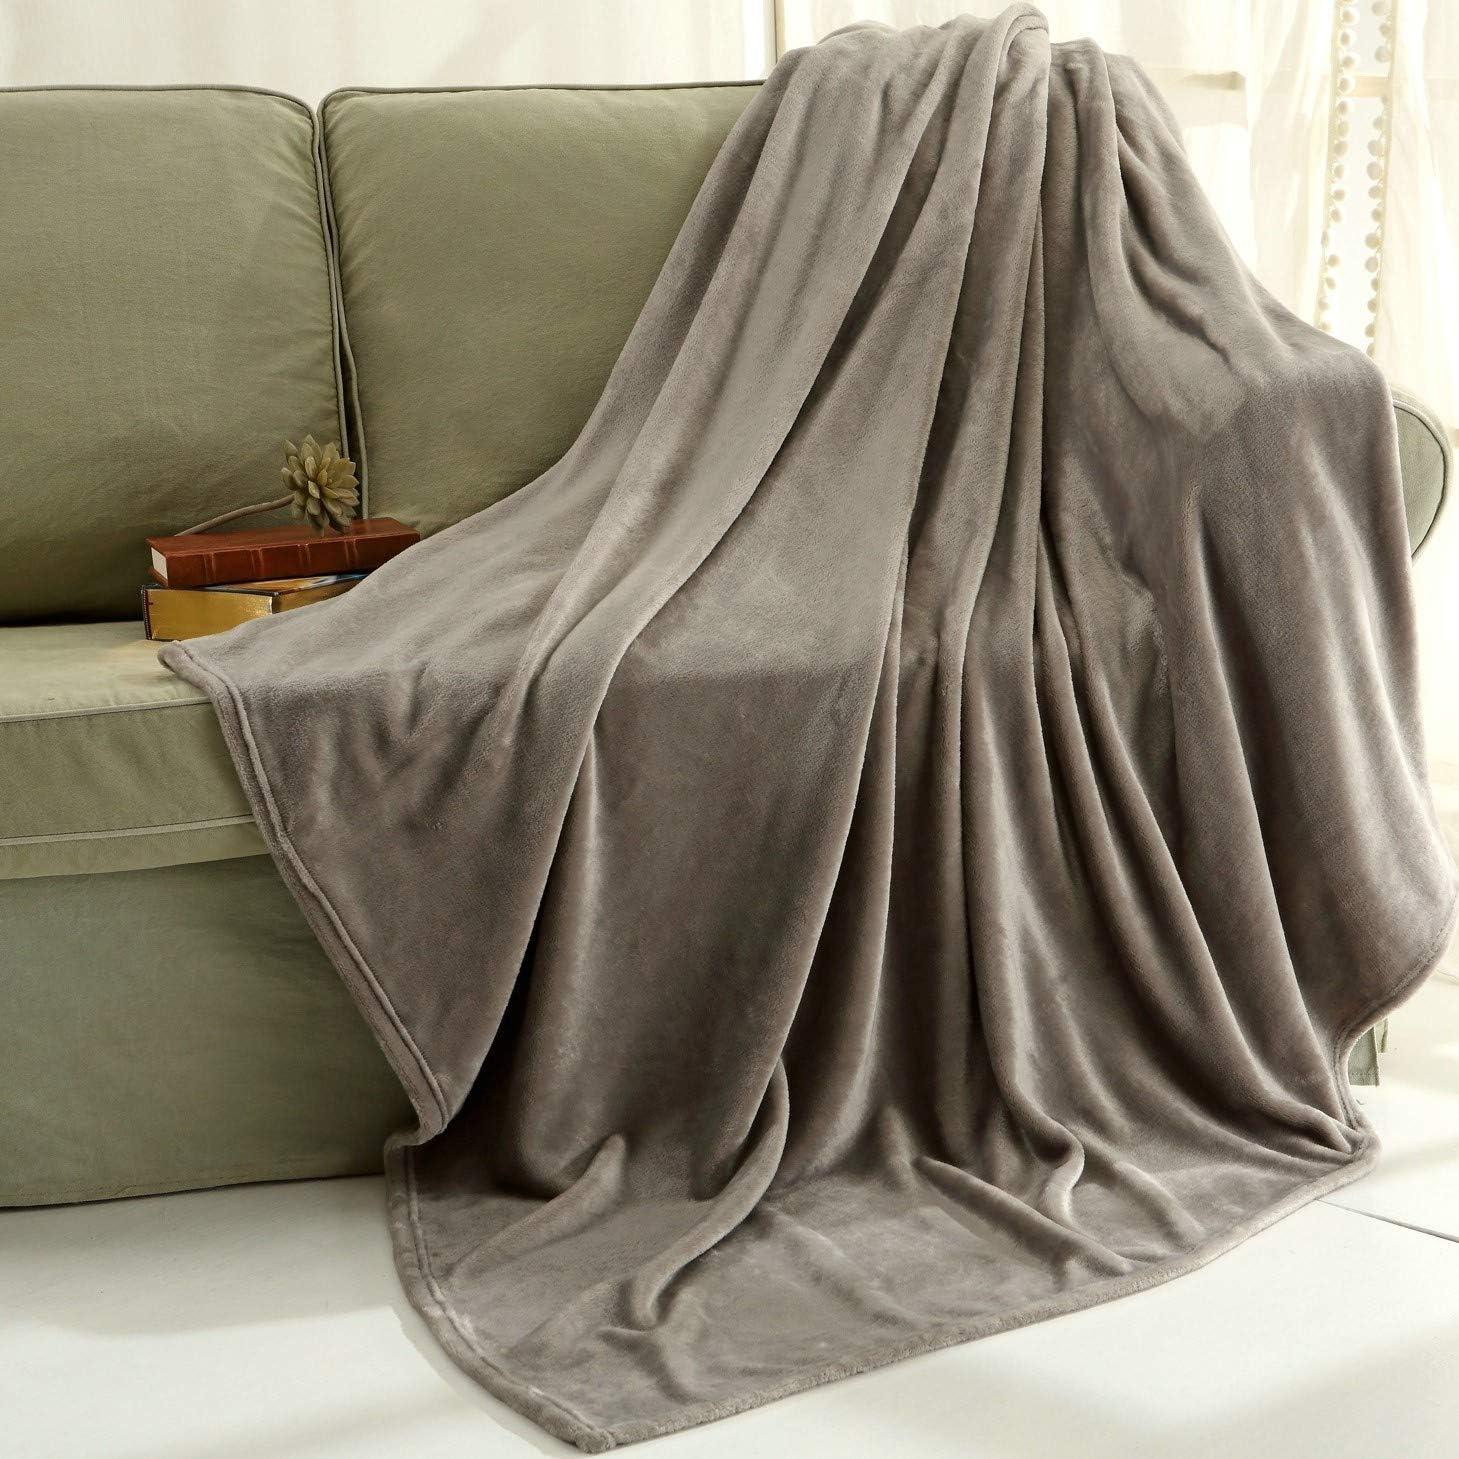 Super Soft Snuggle blanket Living area blanket Natural Colours Von Dutch Decor 130x180 cm NEW